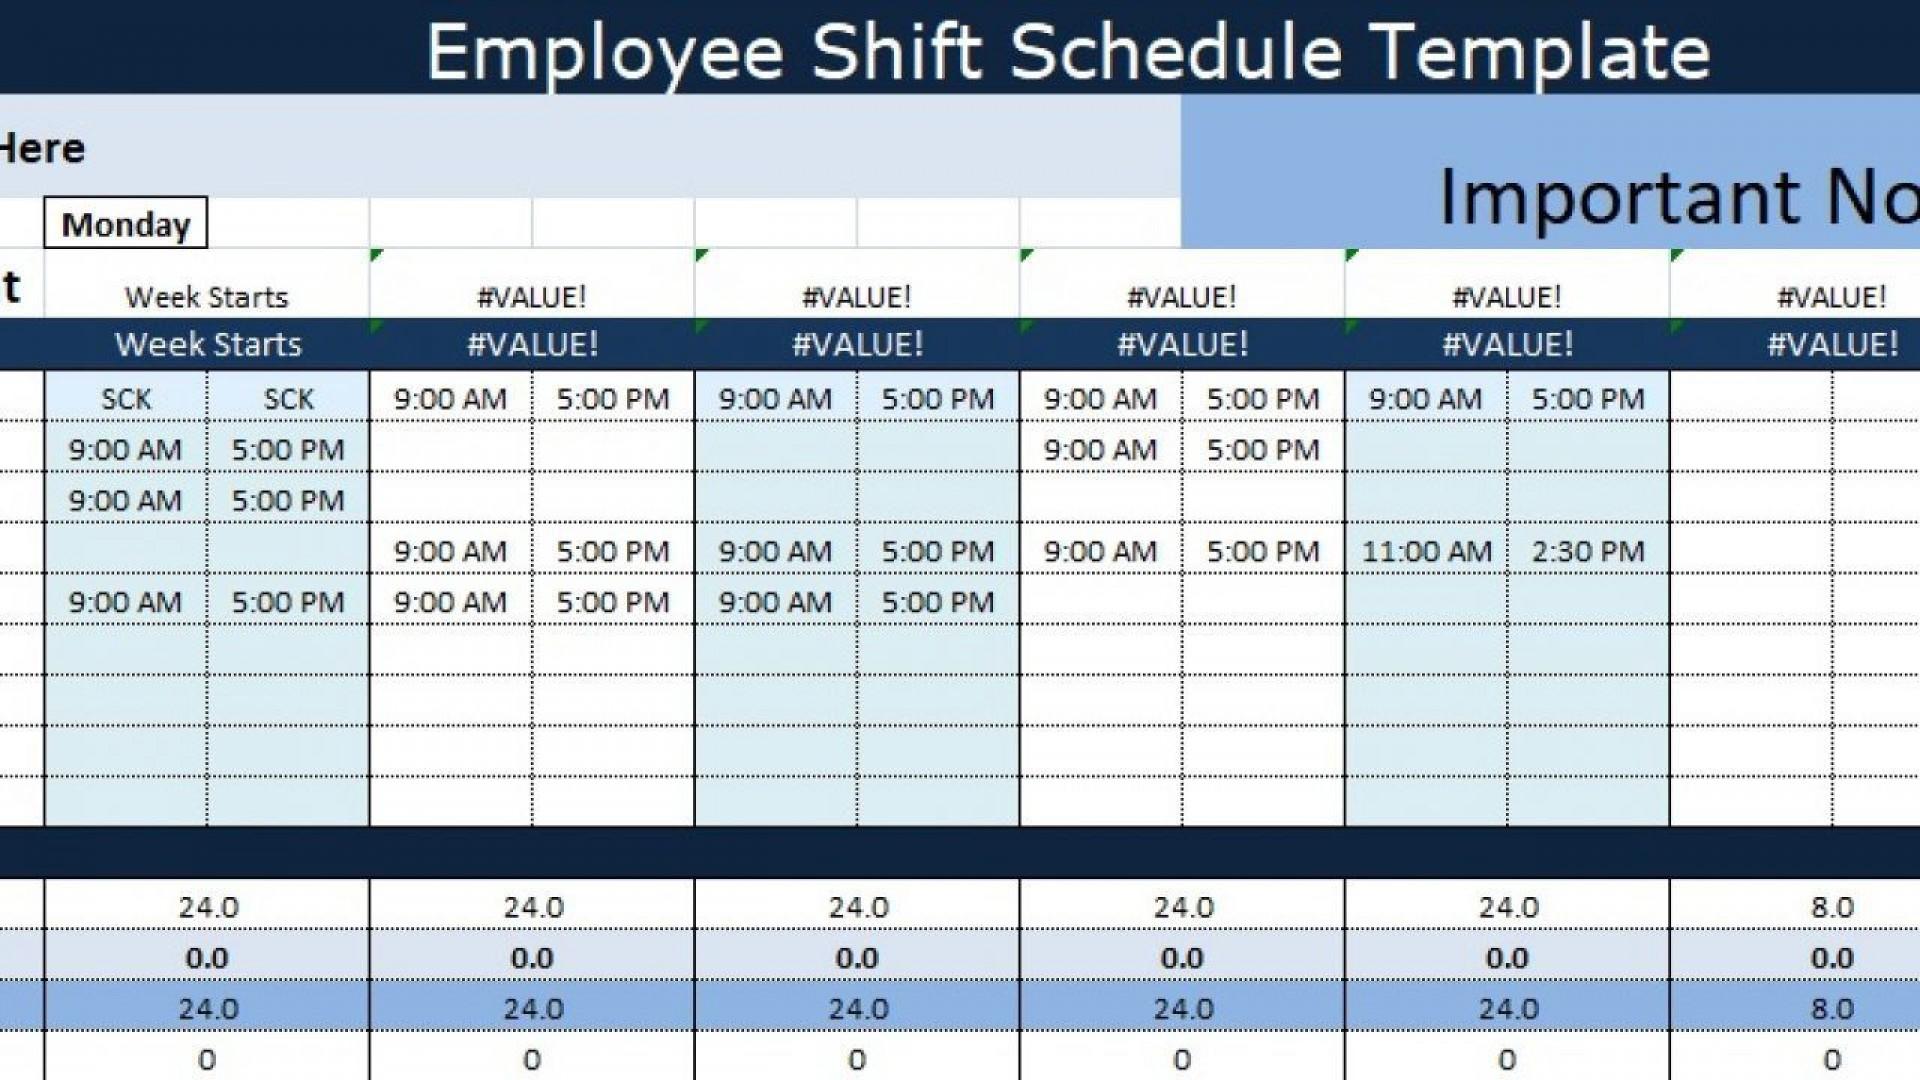 006 Marvelou Employee Shift Scheduling Template Design  Schedule Google Sheet Work Plan Word Weekly Excel Free1920